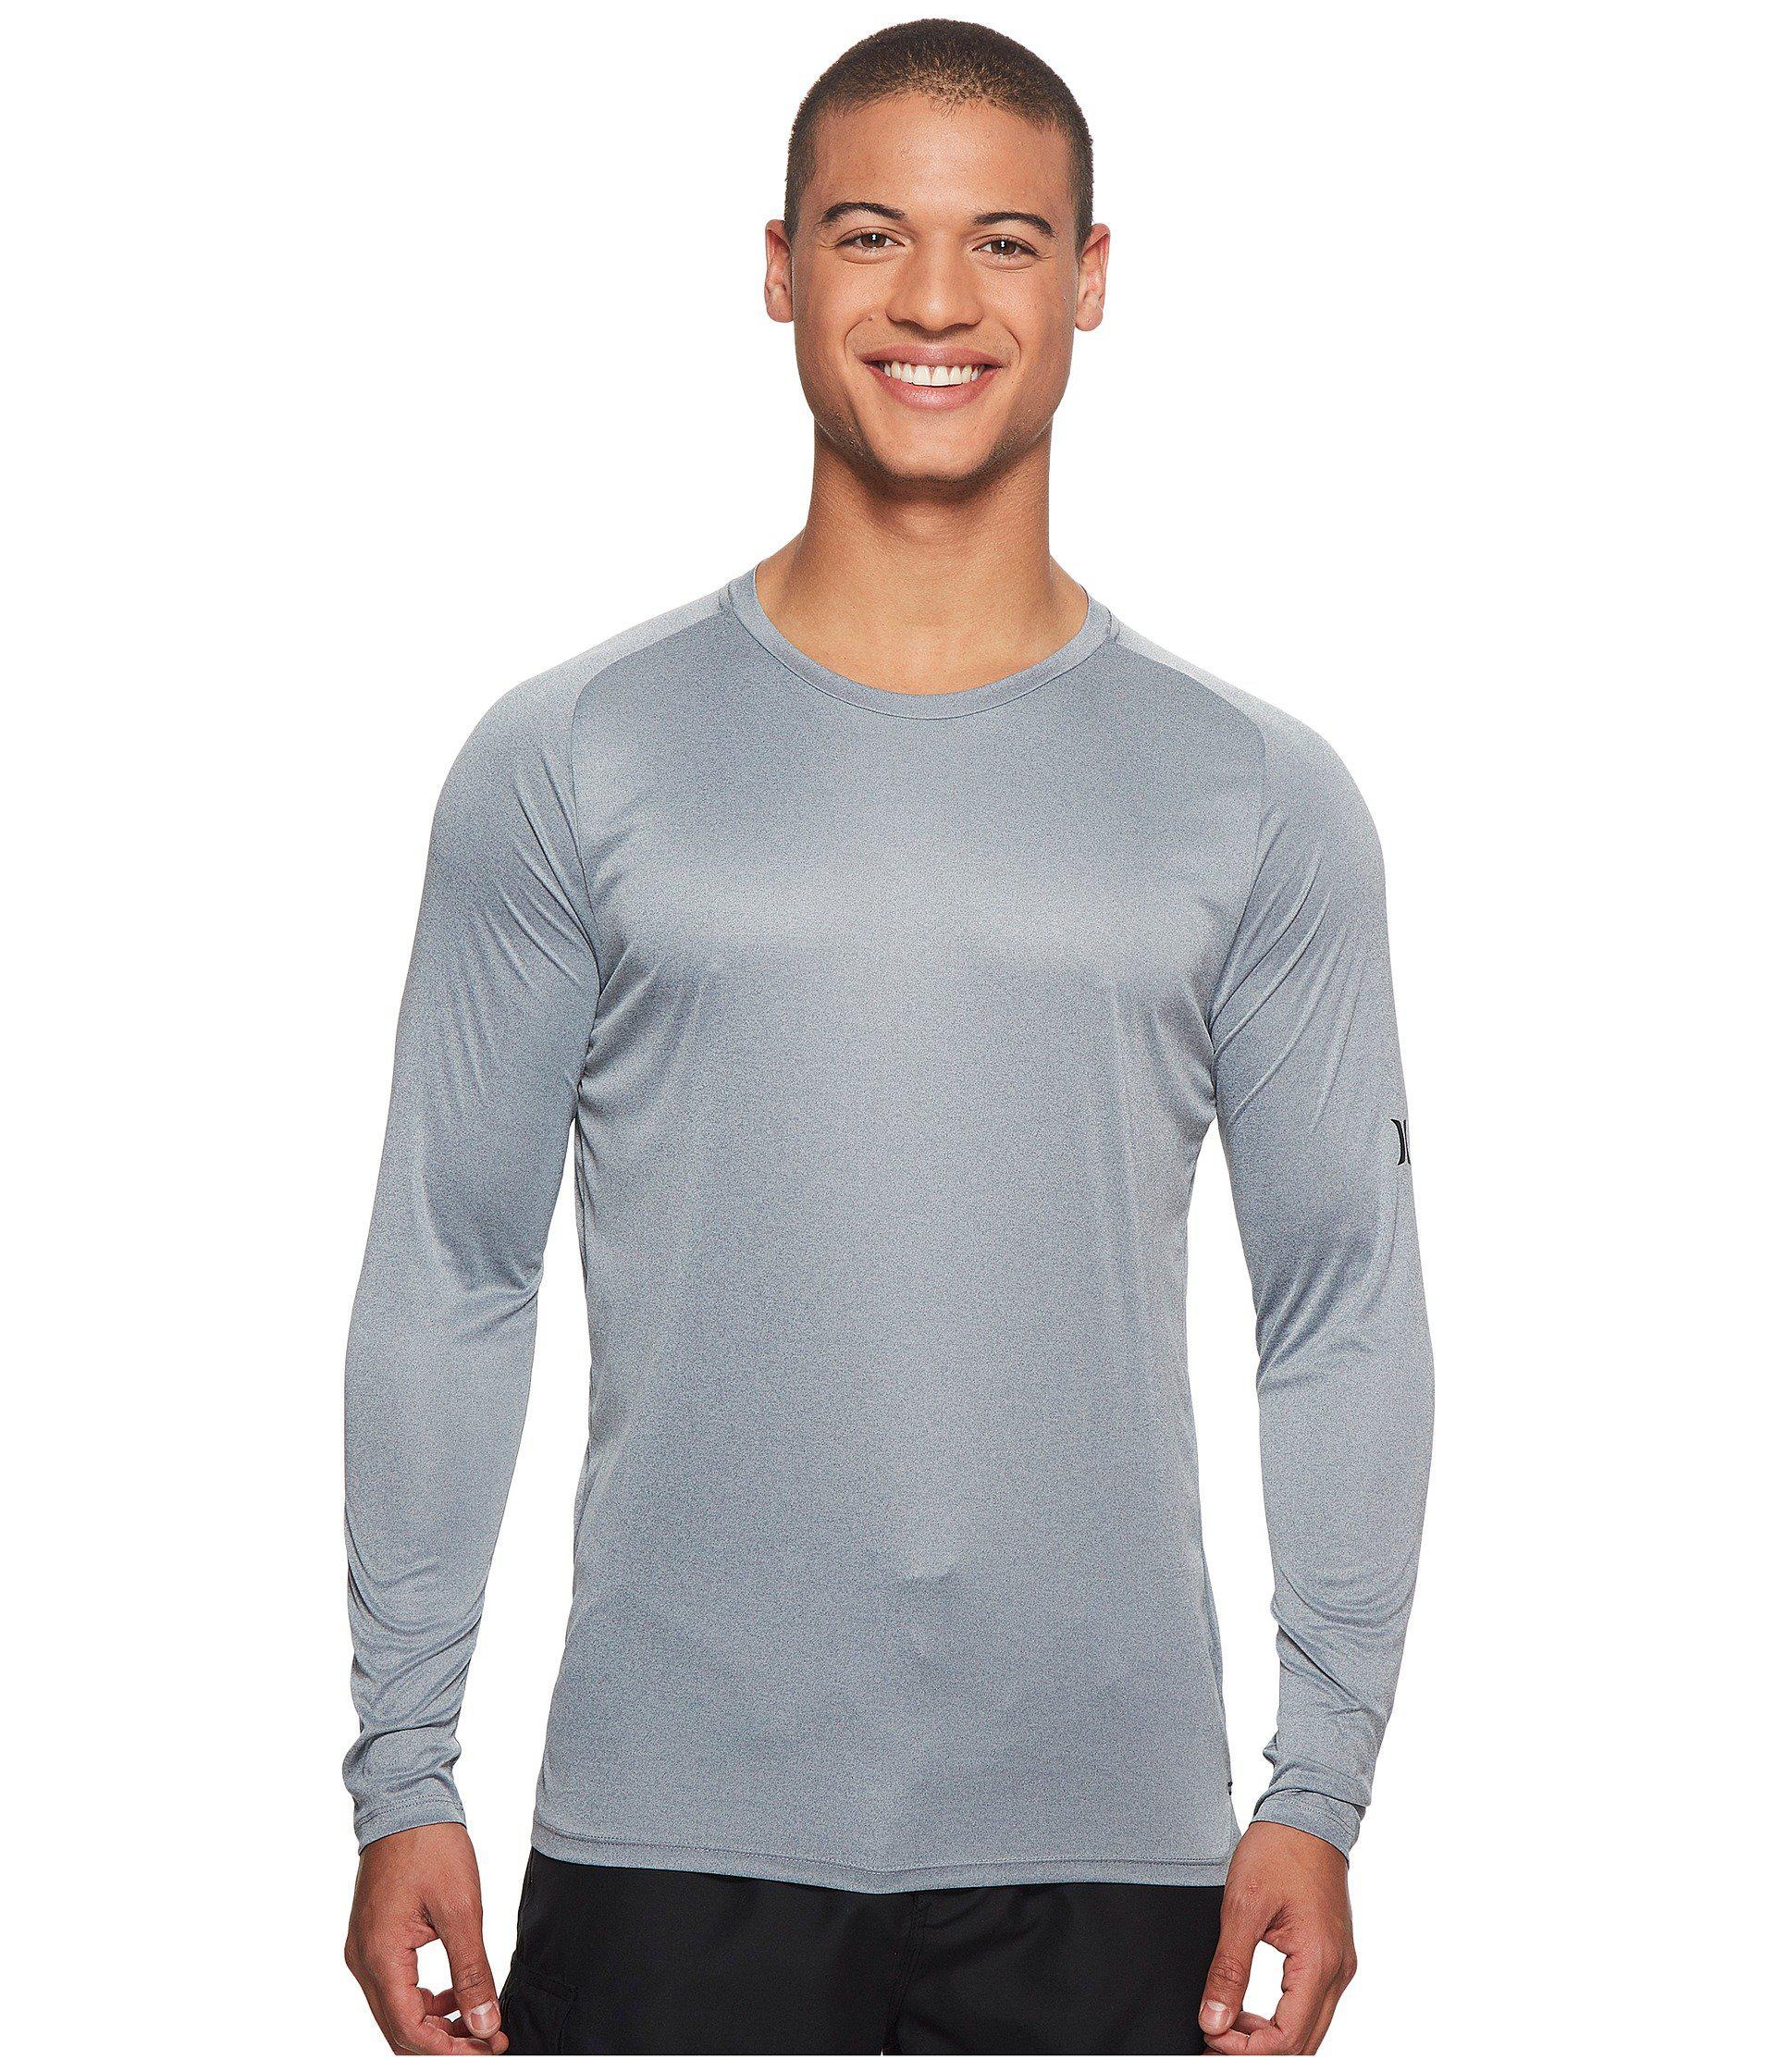 d5cc5a867c Mens Long Sleeve Sun Protection Swim Shirts